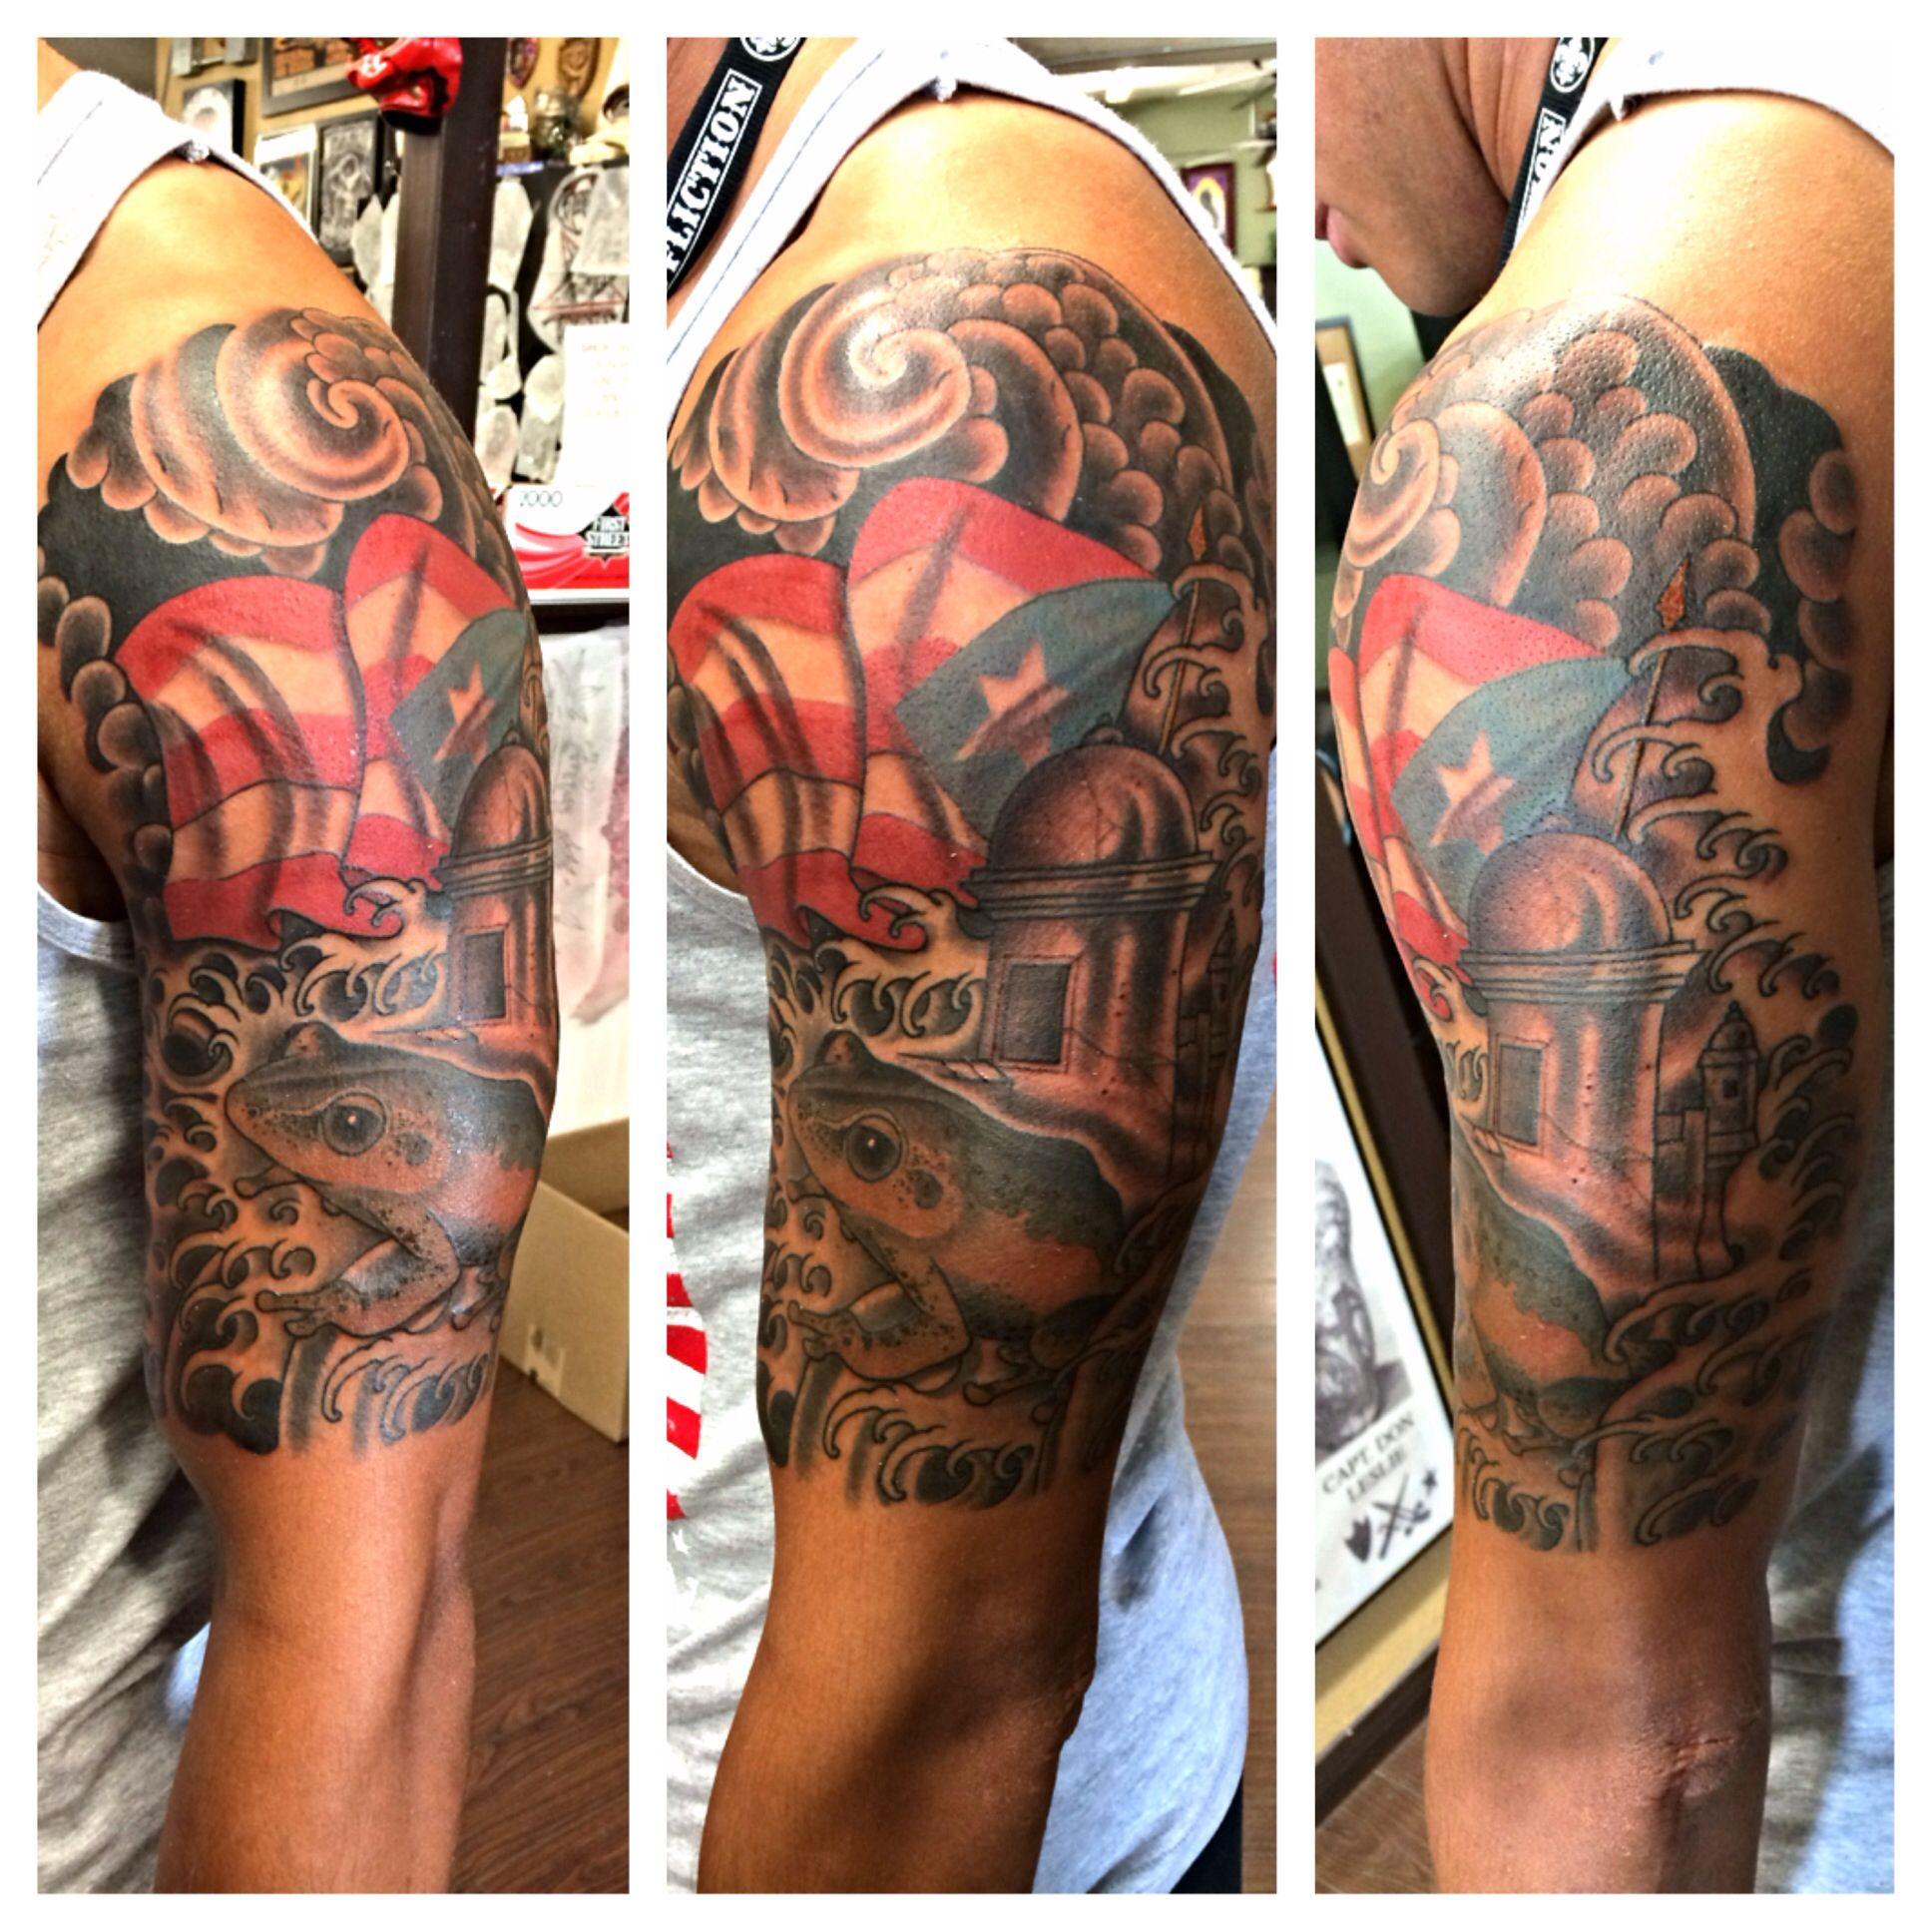 Taino Tattoo For Woman: Puerto Rico Half Sleeve ️